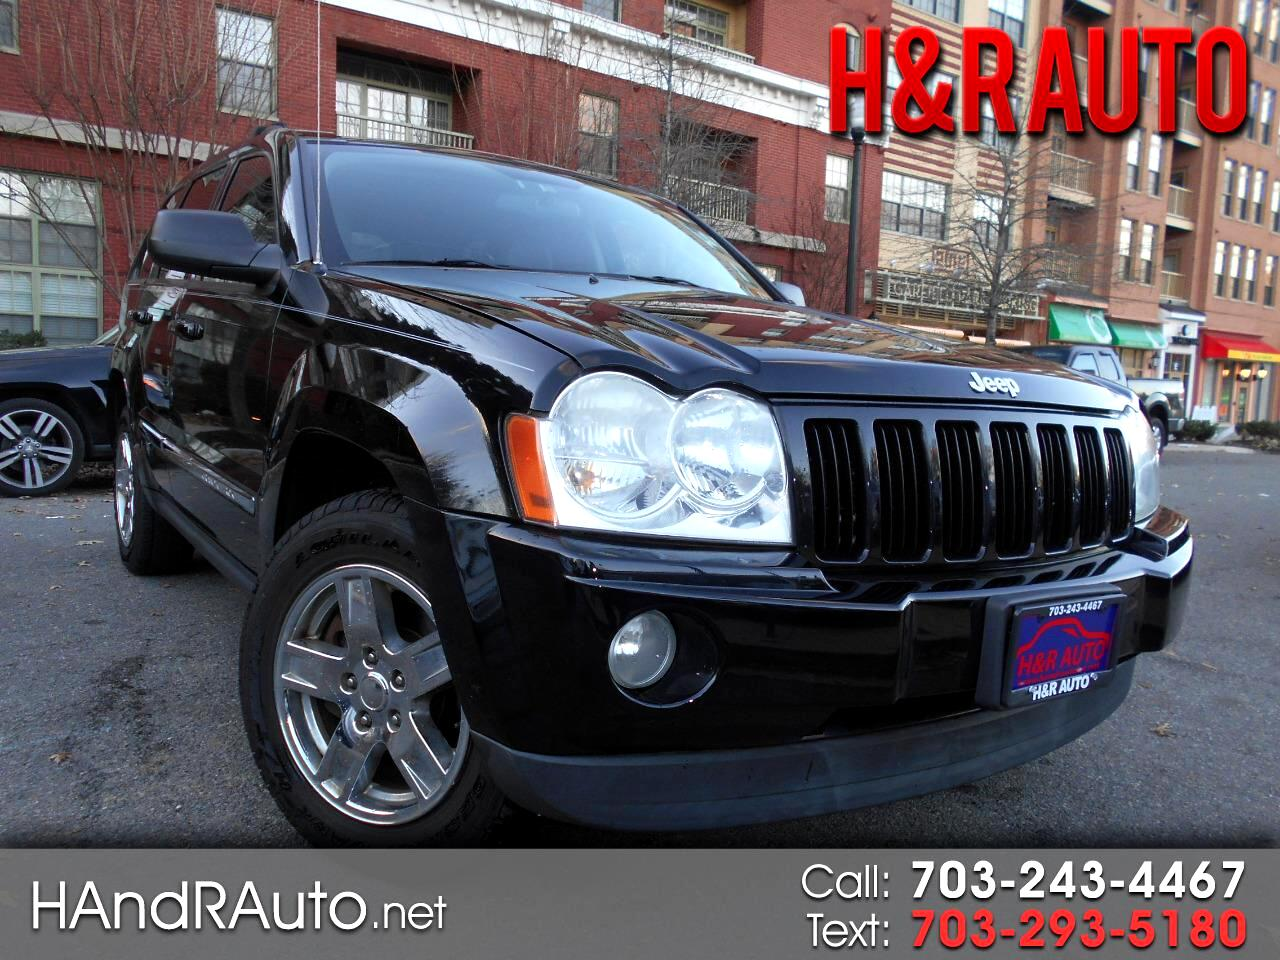 2006 Jeep Grand Cherokee 4dr Laredo 4WD